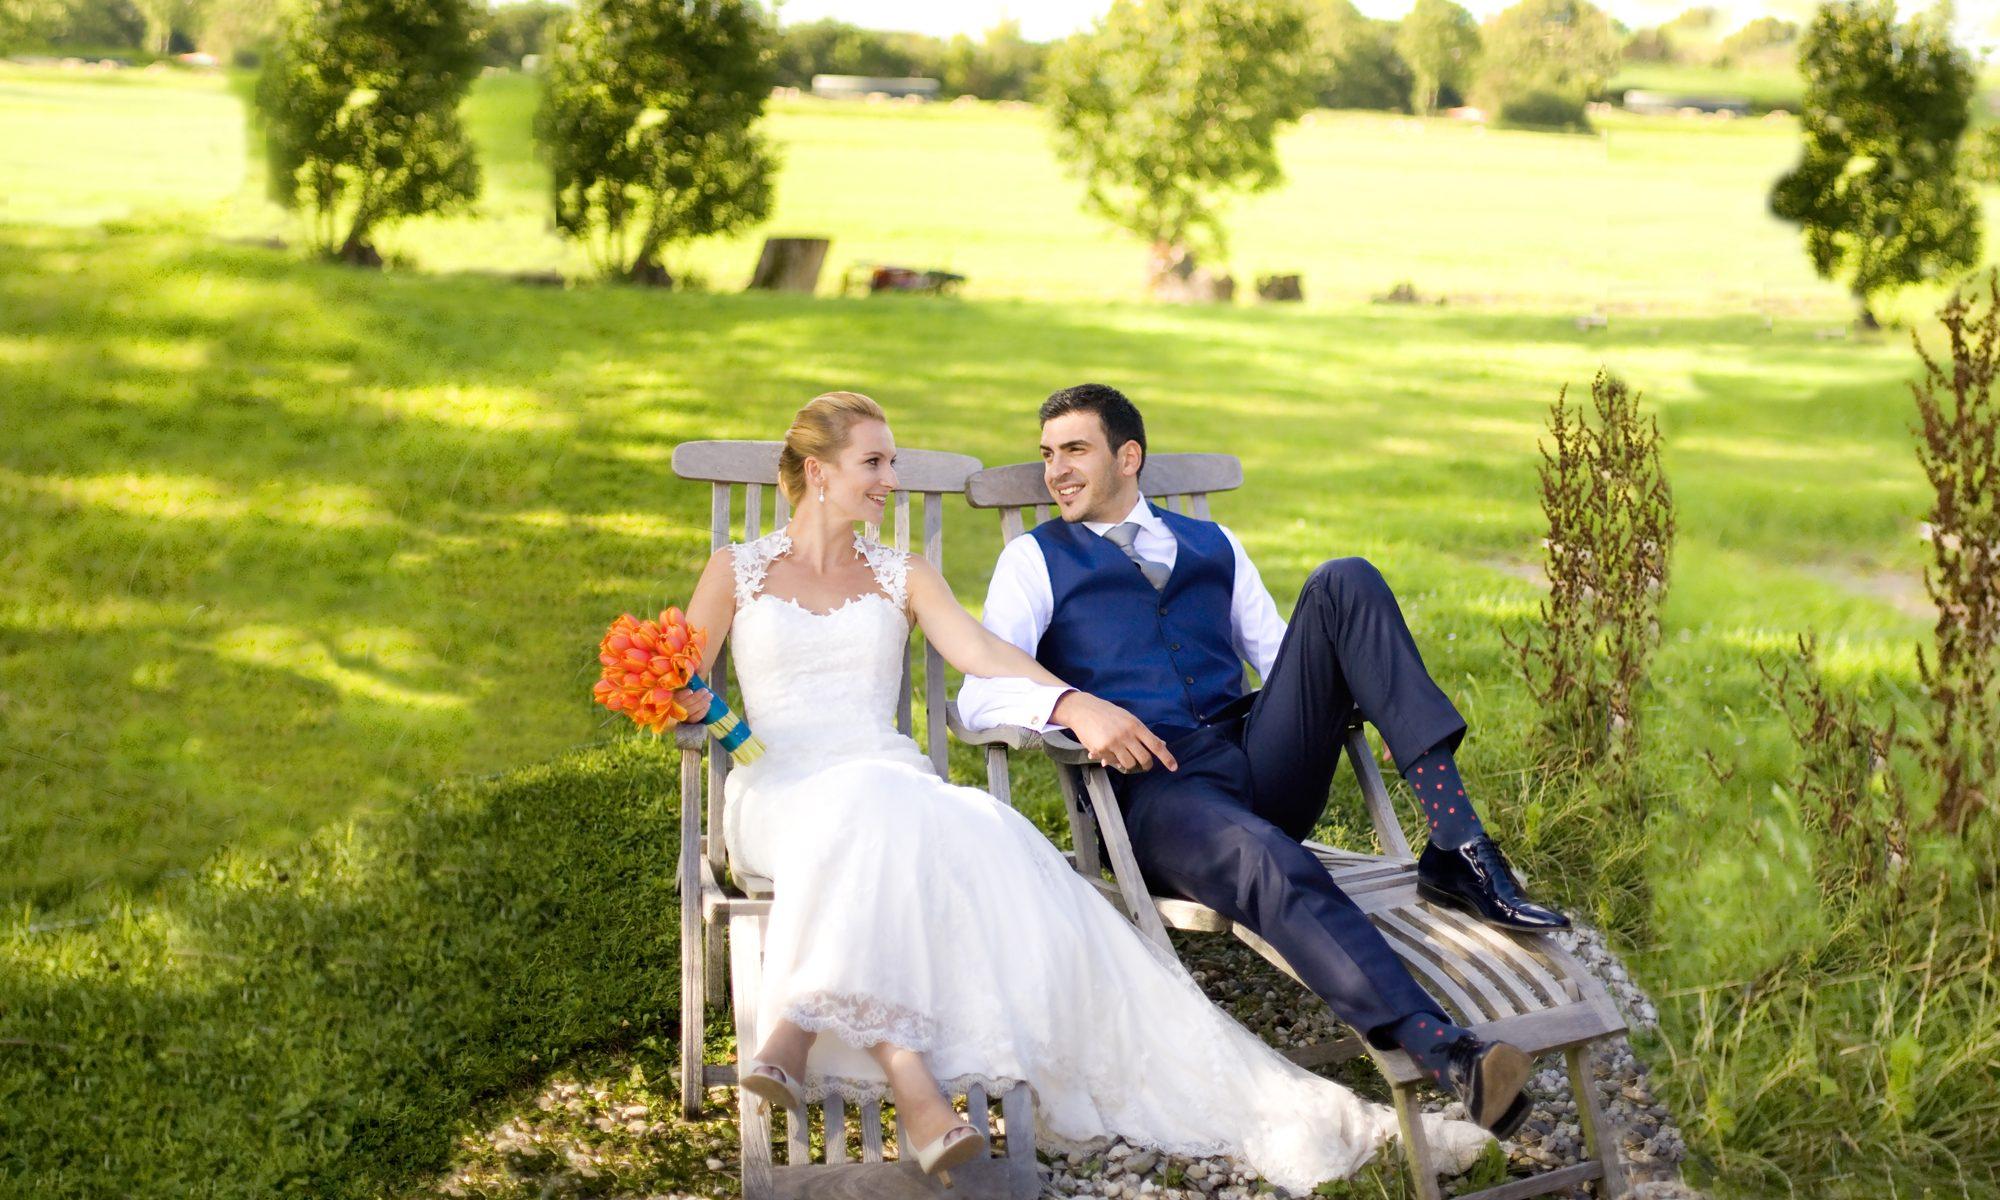 Portfolio Bruidsfotografie bruiloft trouwlocatie bruidspaar ligstoelen weiland De Lindenhof Leiderdorp